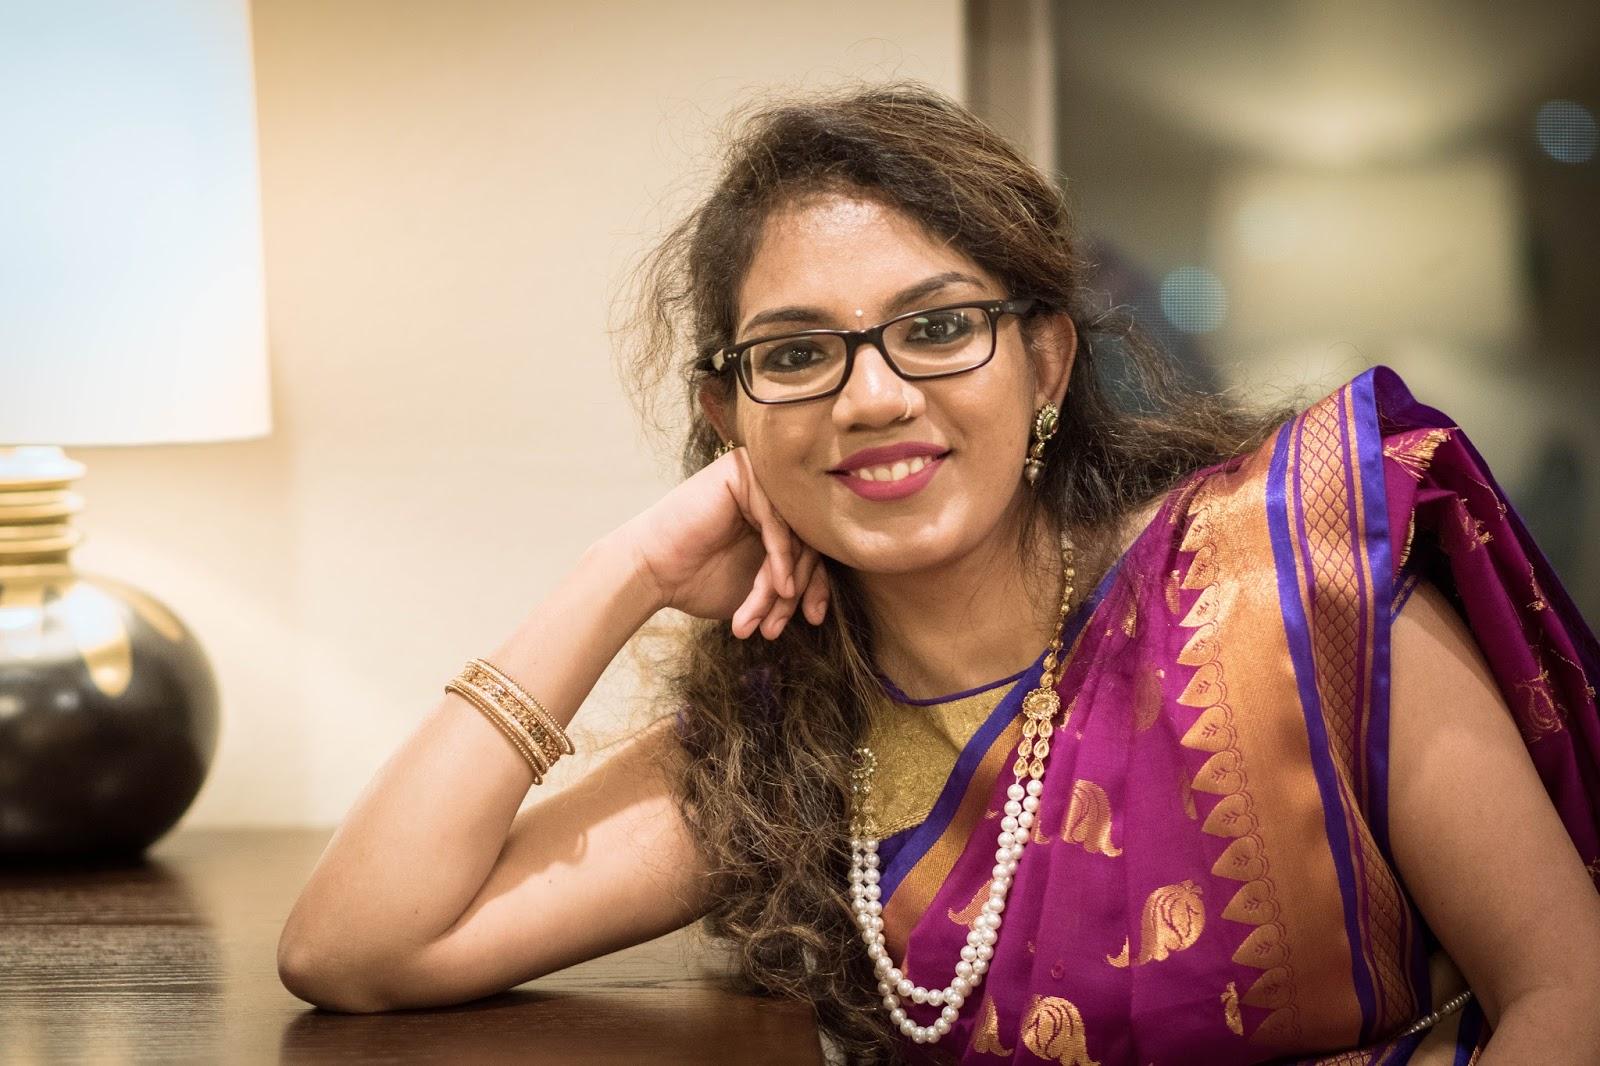 Kanchipuram Sarees_Jewellers Lane_AimforGlam_Cancan Saree Drape